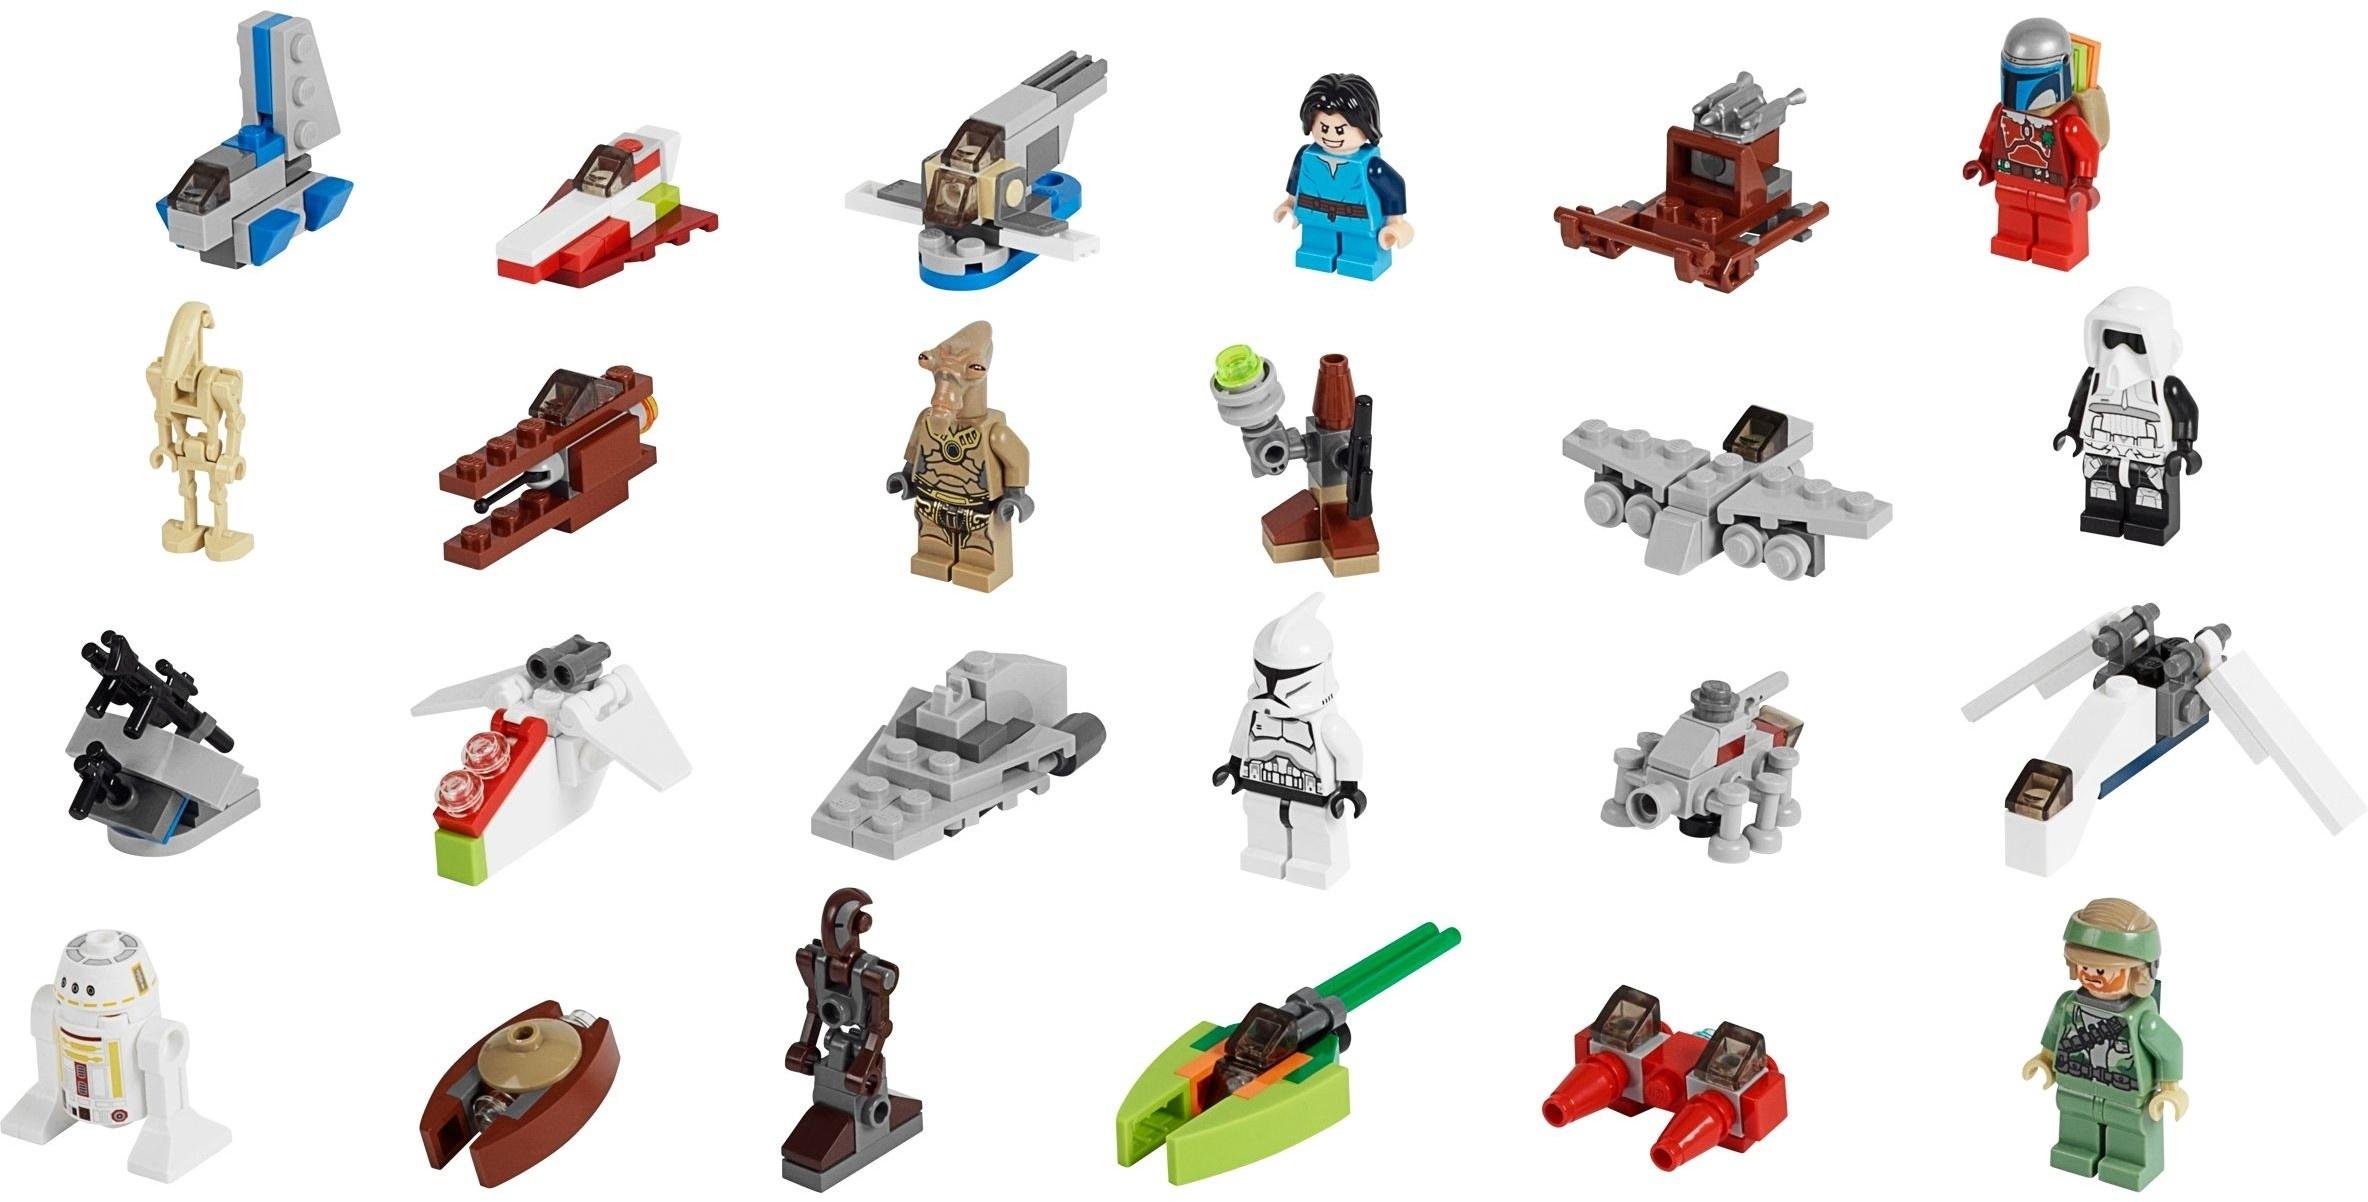 Lego Star Wars Advent Calendar Instructions 75023, Star Wars  Lego Star Wars Instructions Advent Calendar